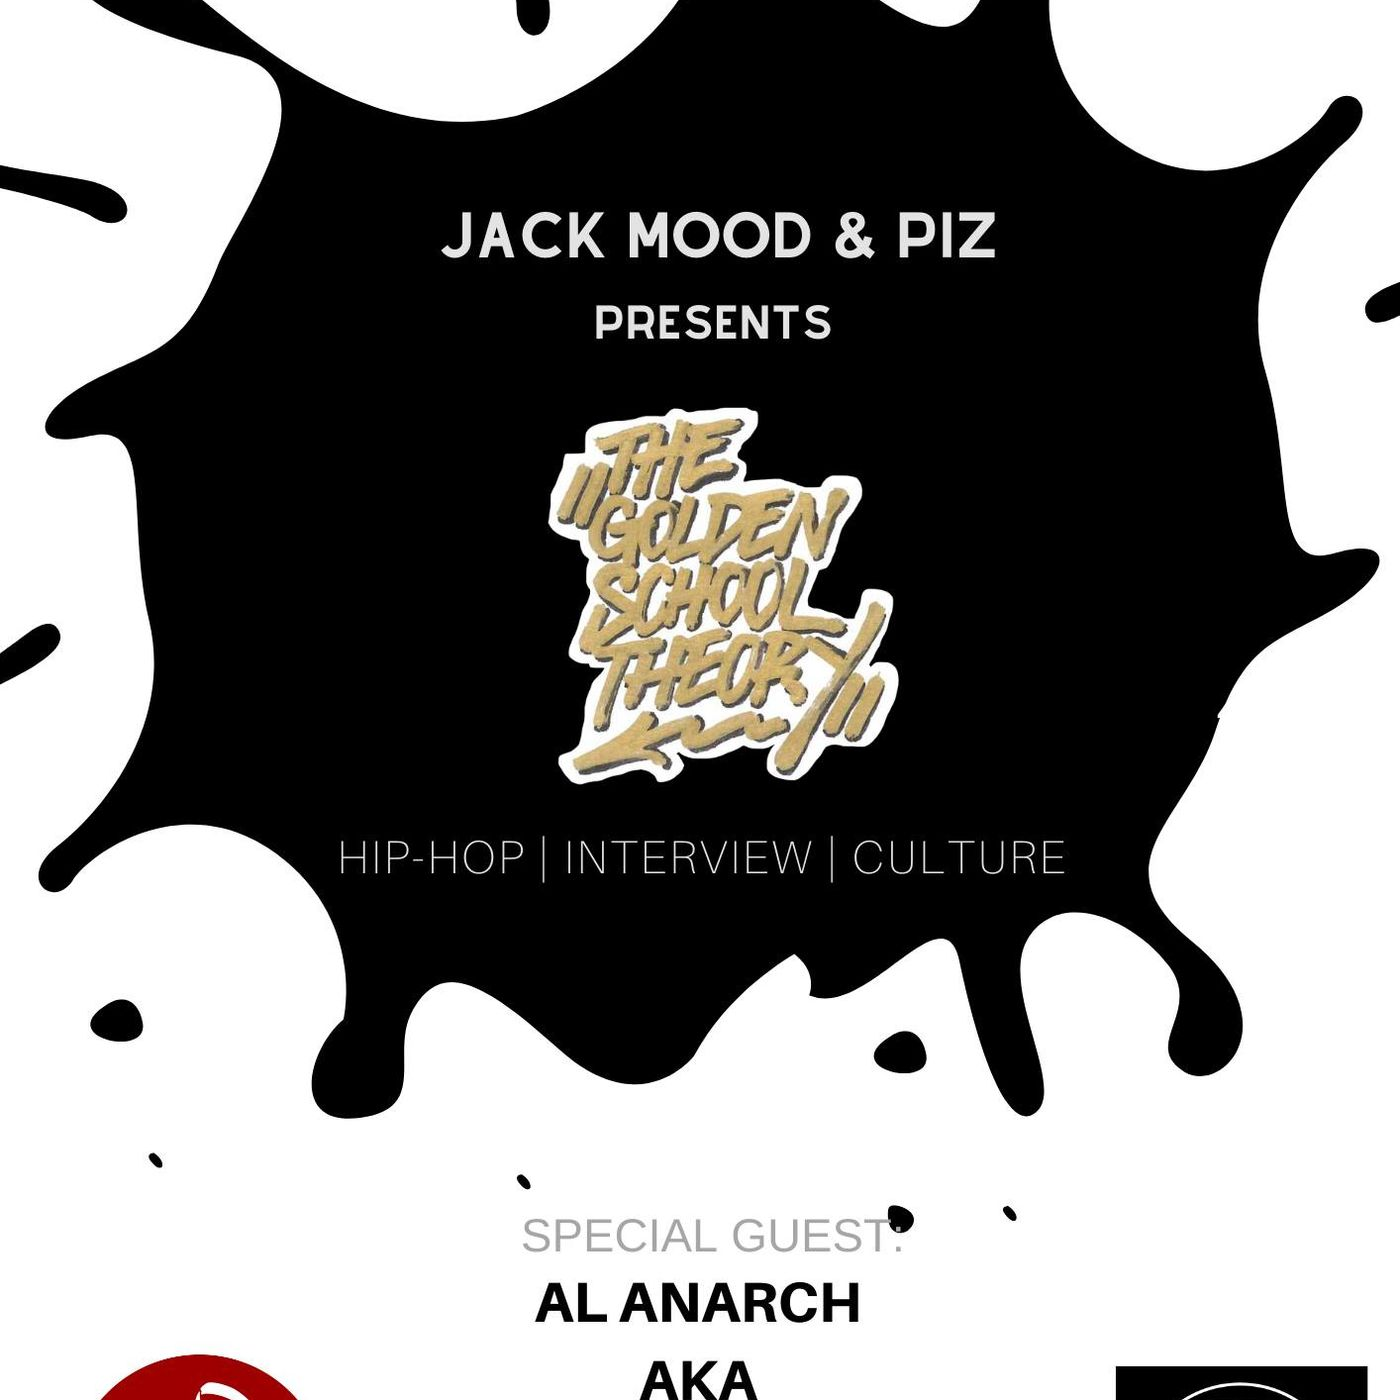 Jack, Mood & Piz presents The Golden School Theory - s01e10